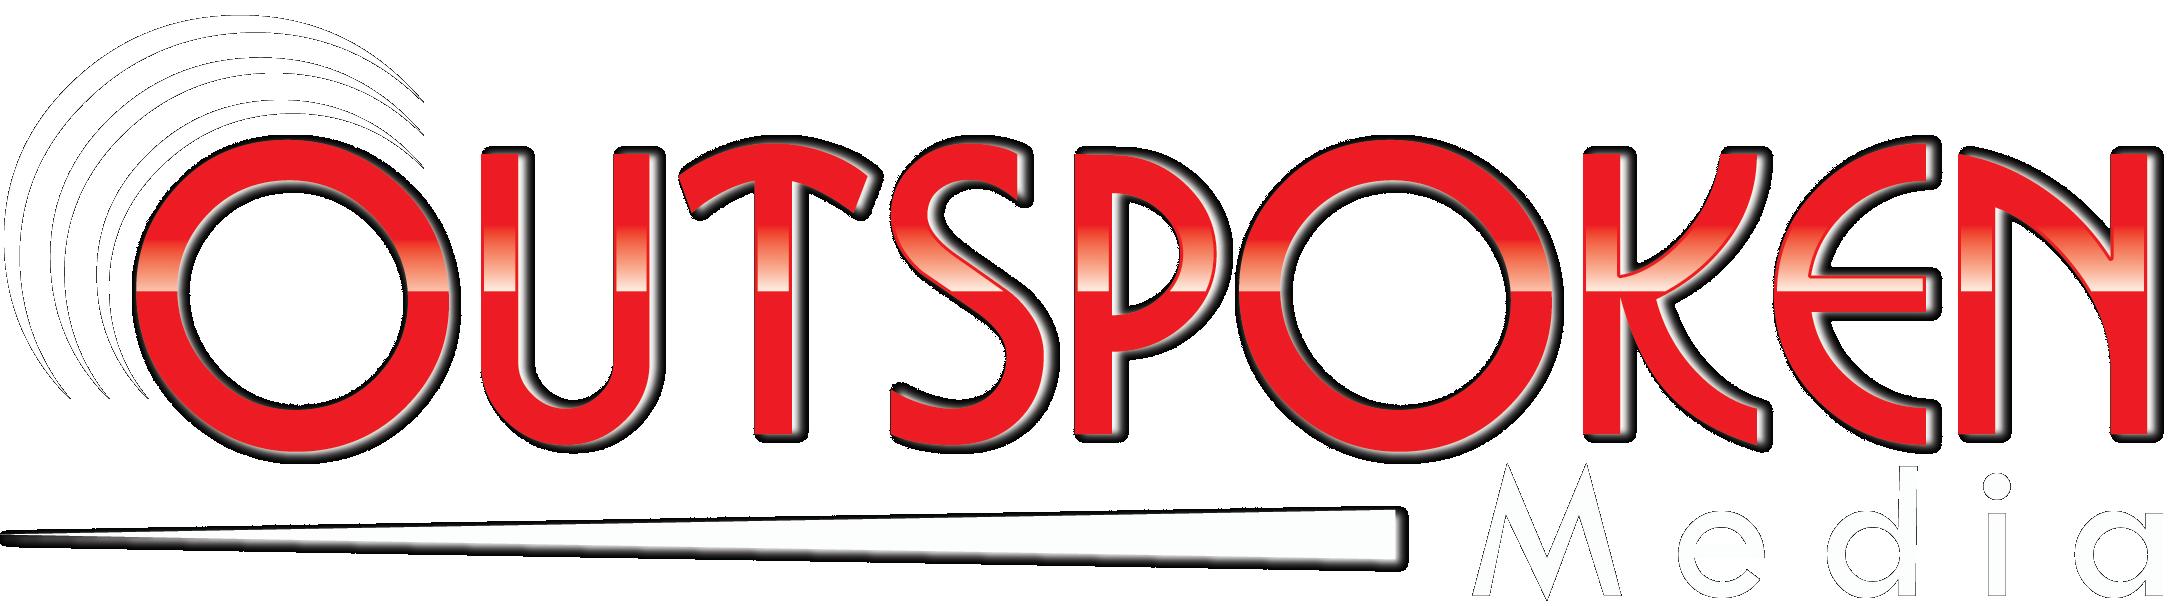 Movie star red carpet clipart transparent download Home - Outspoken Media Group transparent download